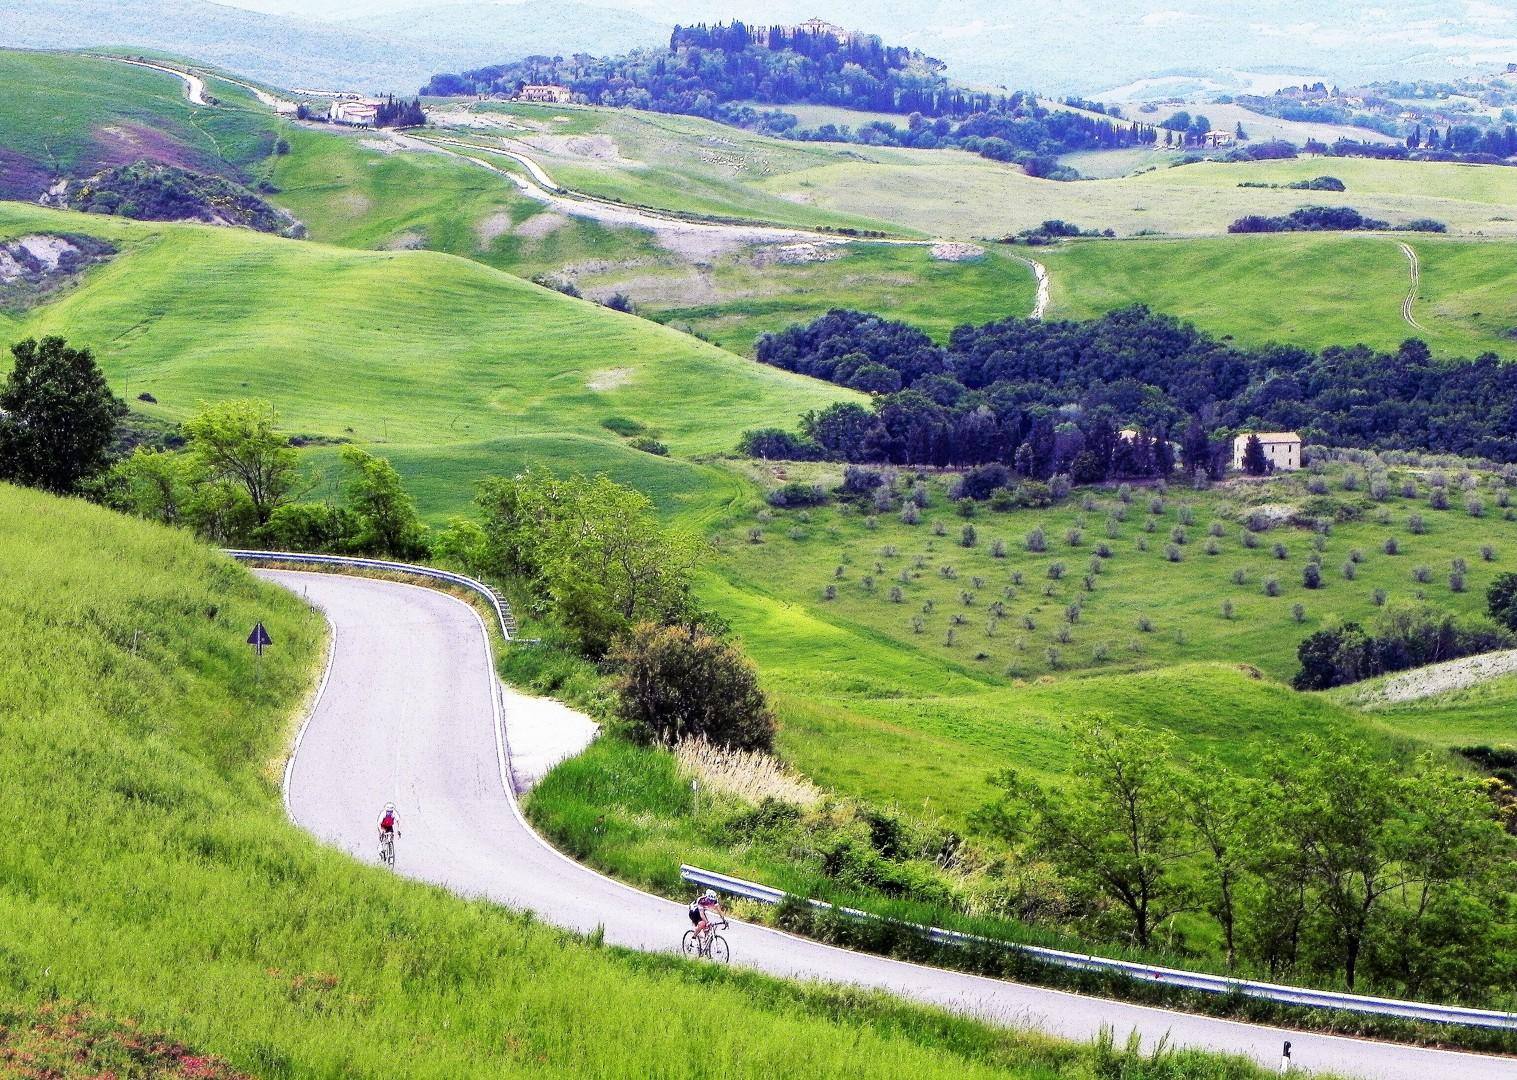 landscapes-italy-tuscany-road-cycling.jpg - Italy - Tuscany Tourer - Guided Road Cycling Holiday - Italia Road Cycling